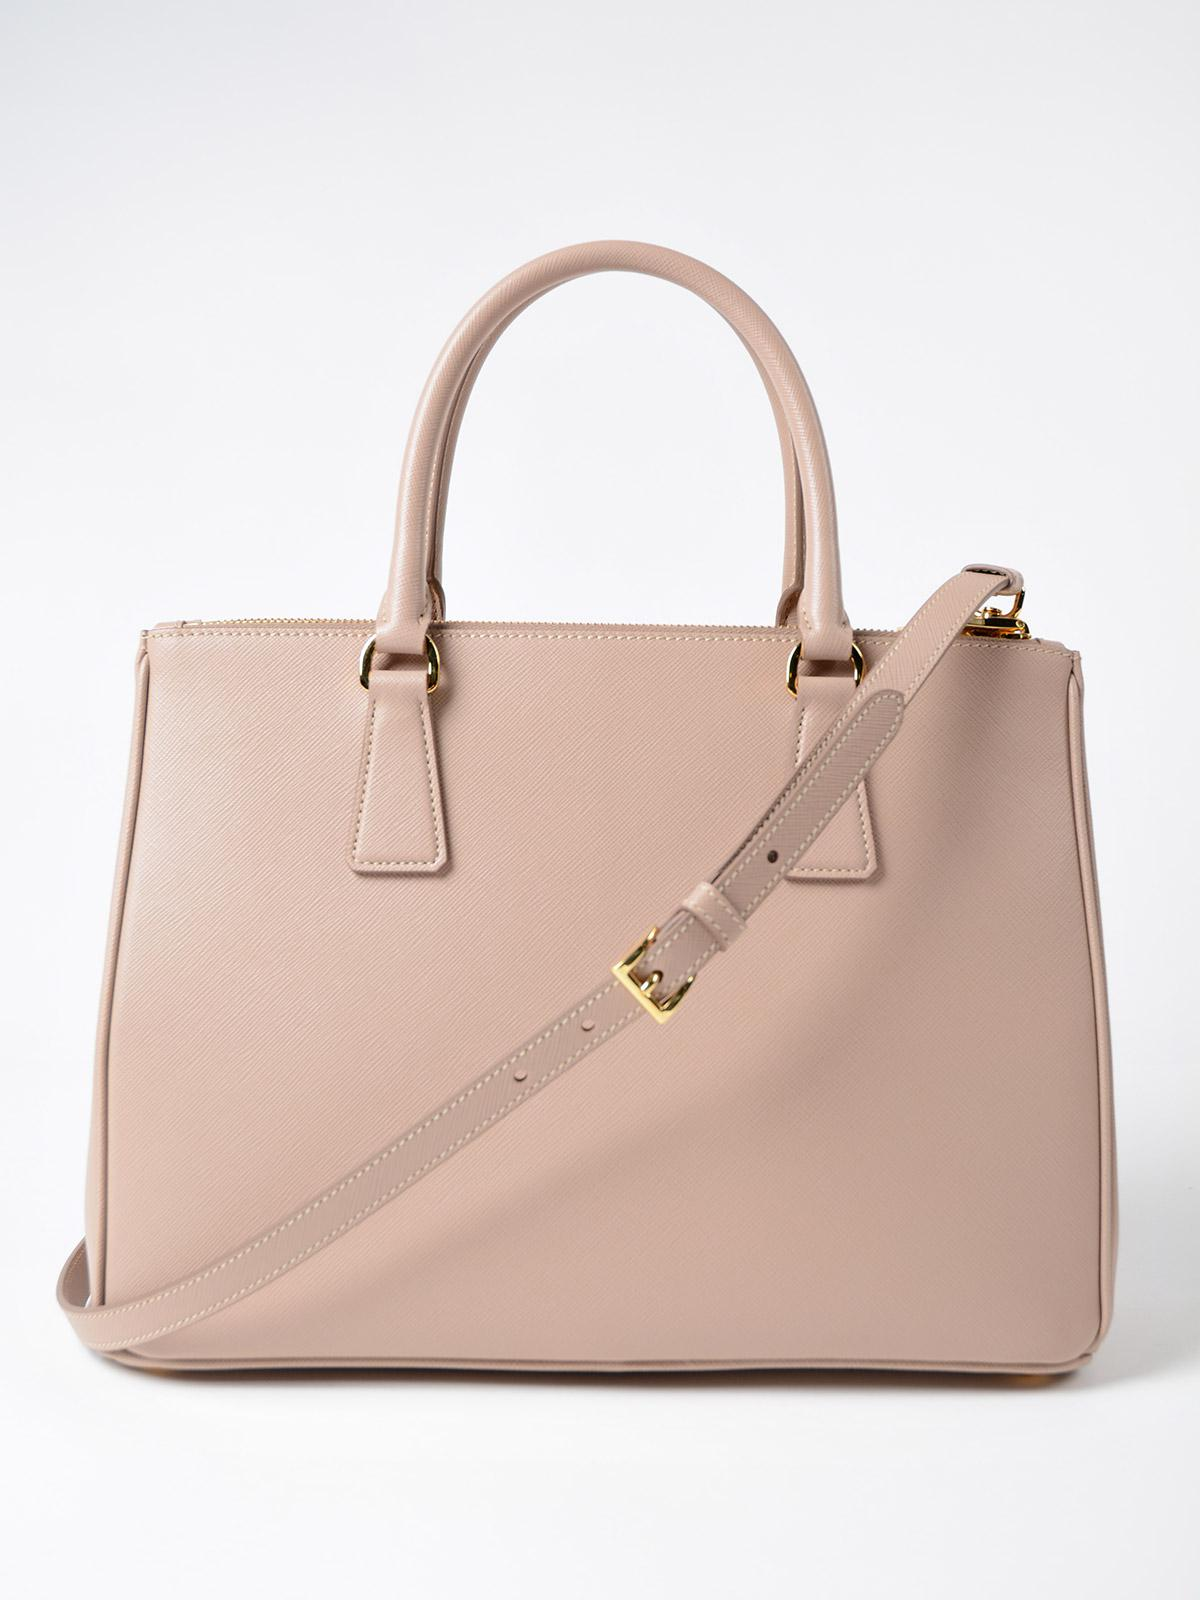 40b6557f73 ... promo code for lyst prada saffiano lux galleria bag ac1b5 53757